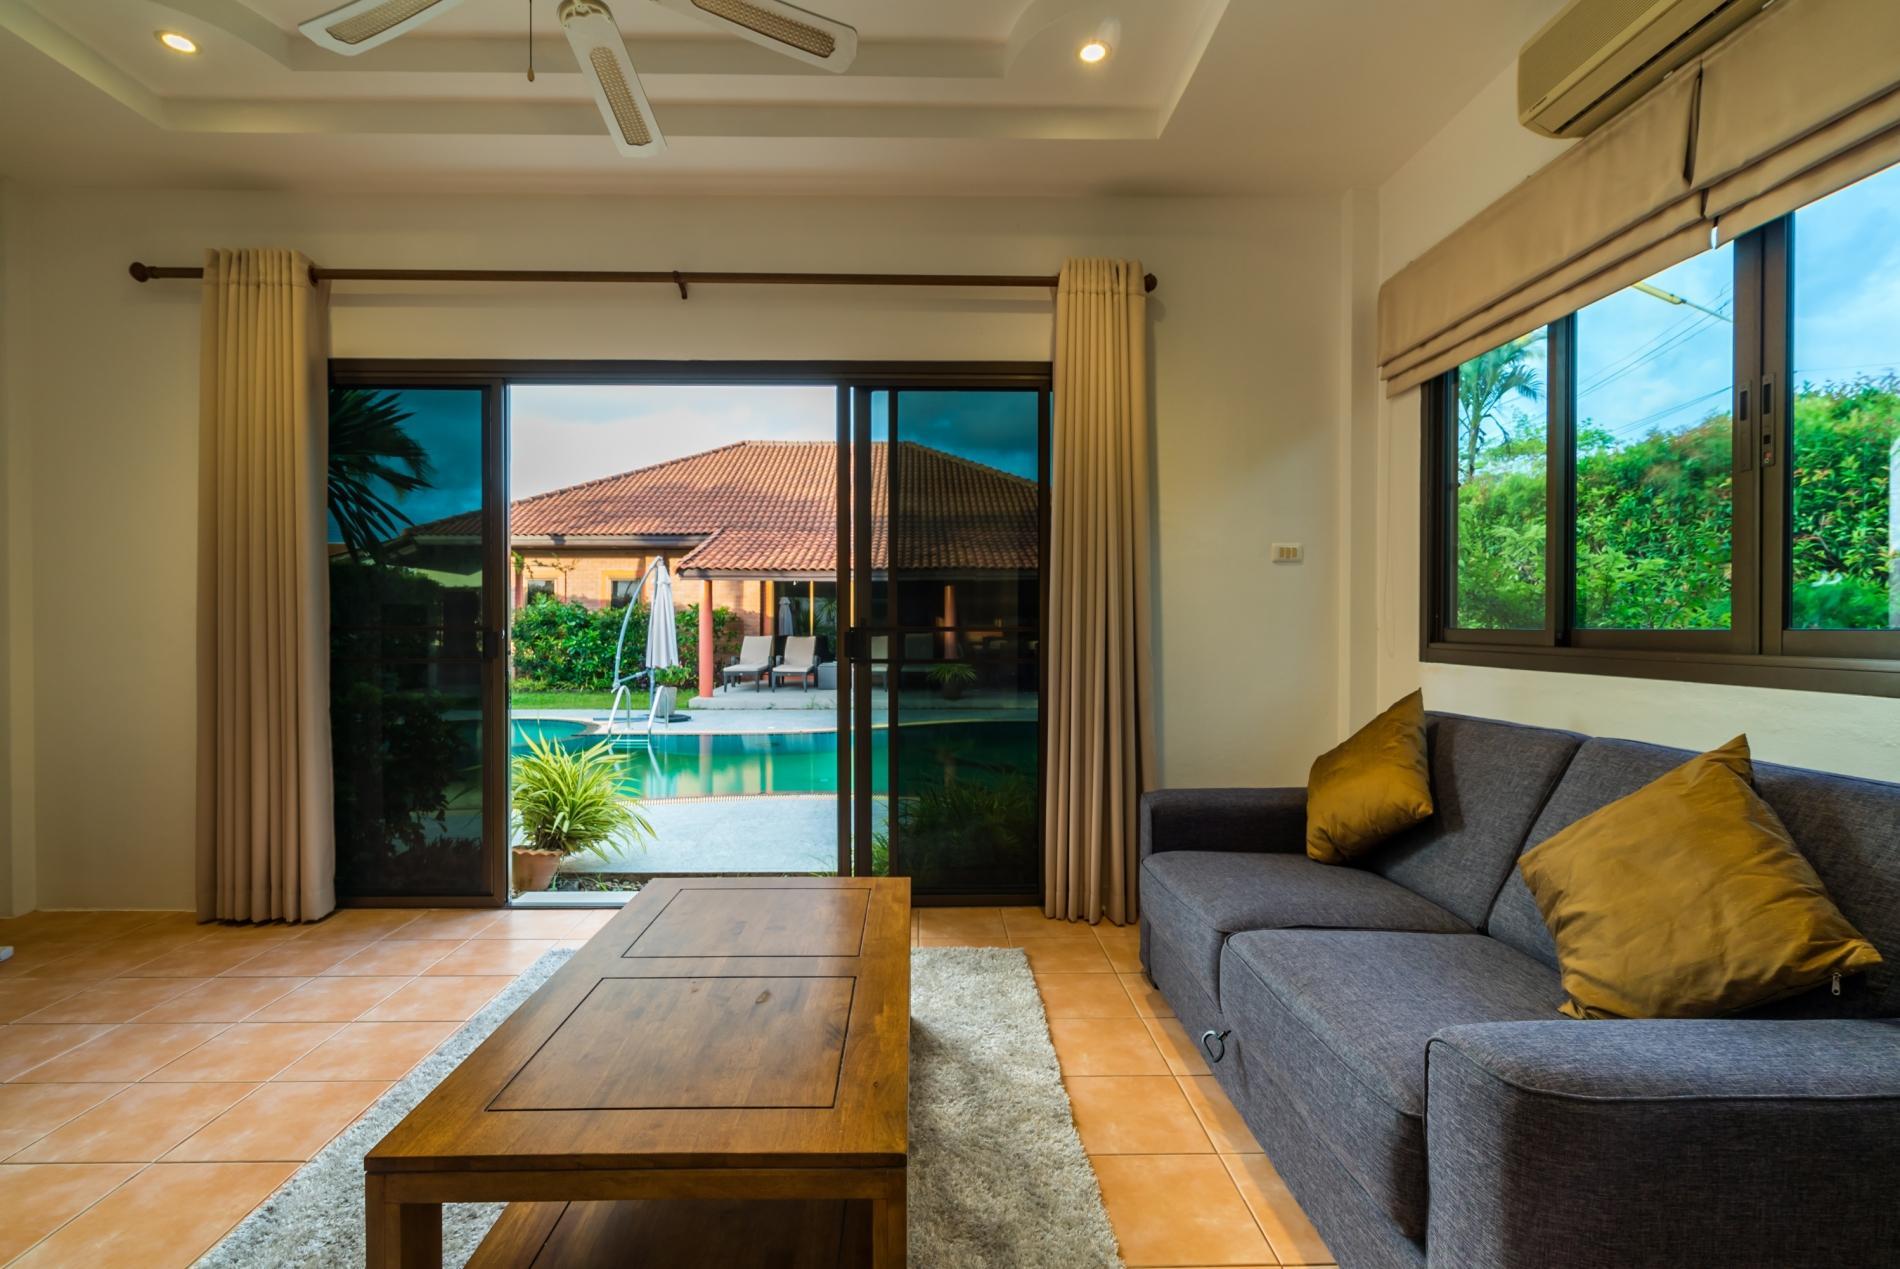 Apartment Pasak soi 3 - Convenient pool villa in quiet location  near Laguna  Boat avenue photo 19552930